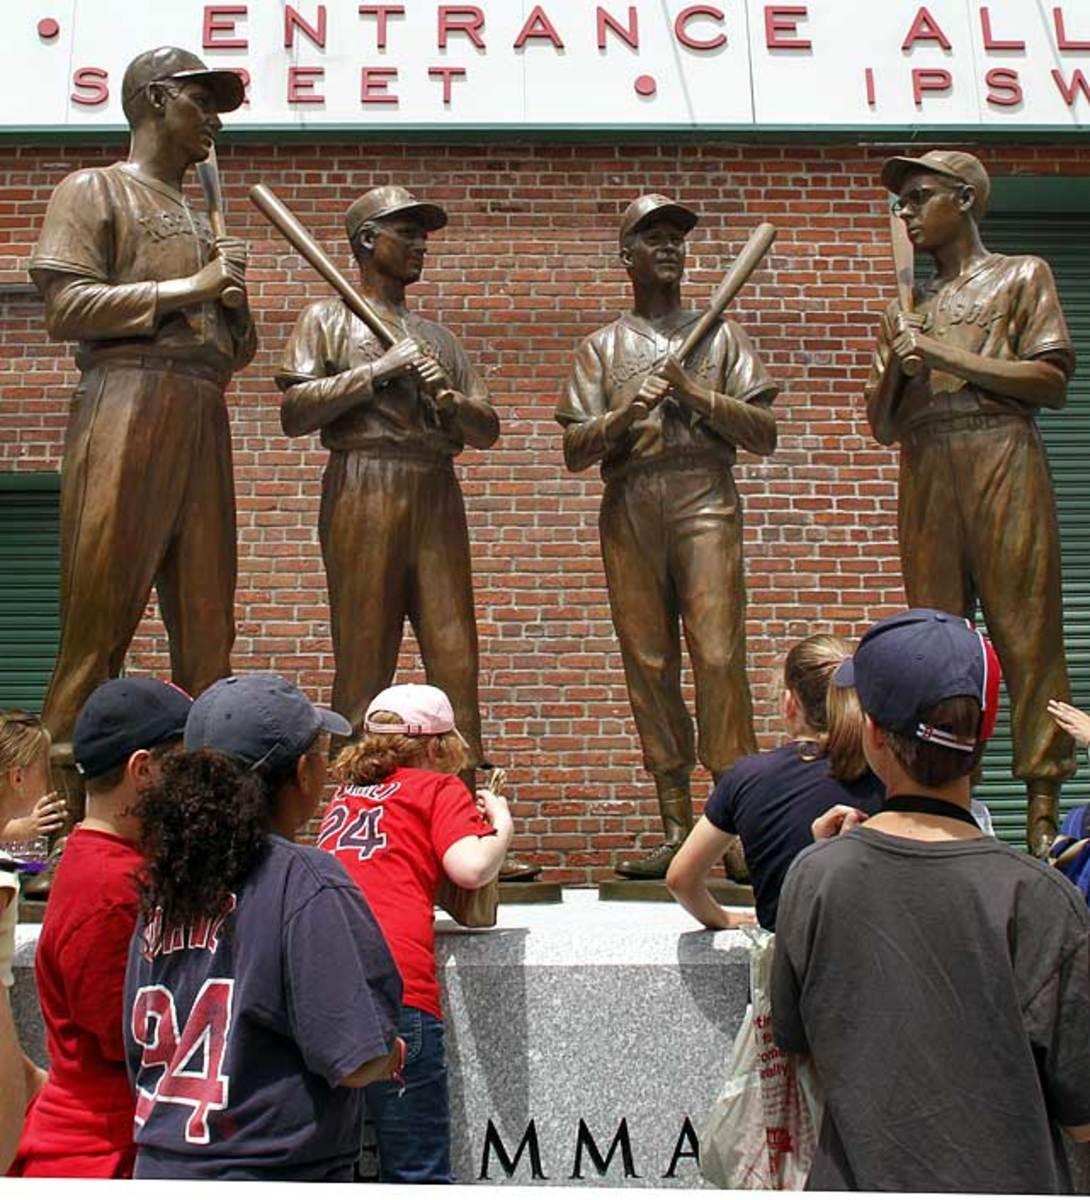 Ted Williams, Bobby Doerr, Johnny Pesky, and Dom DiMaggio